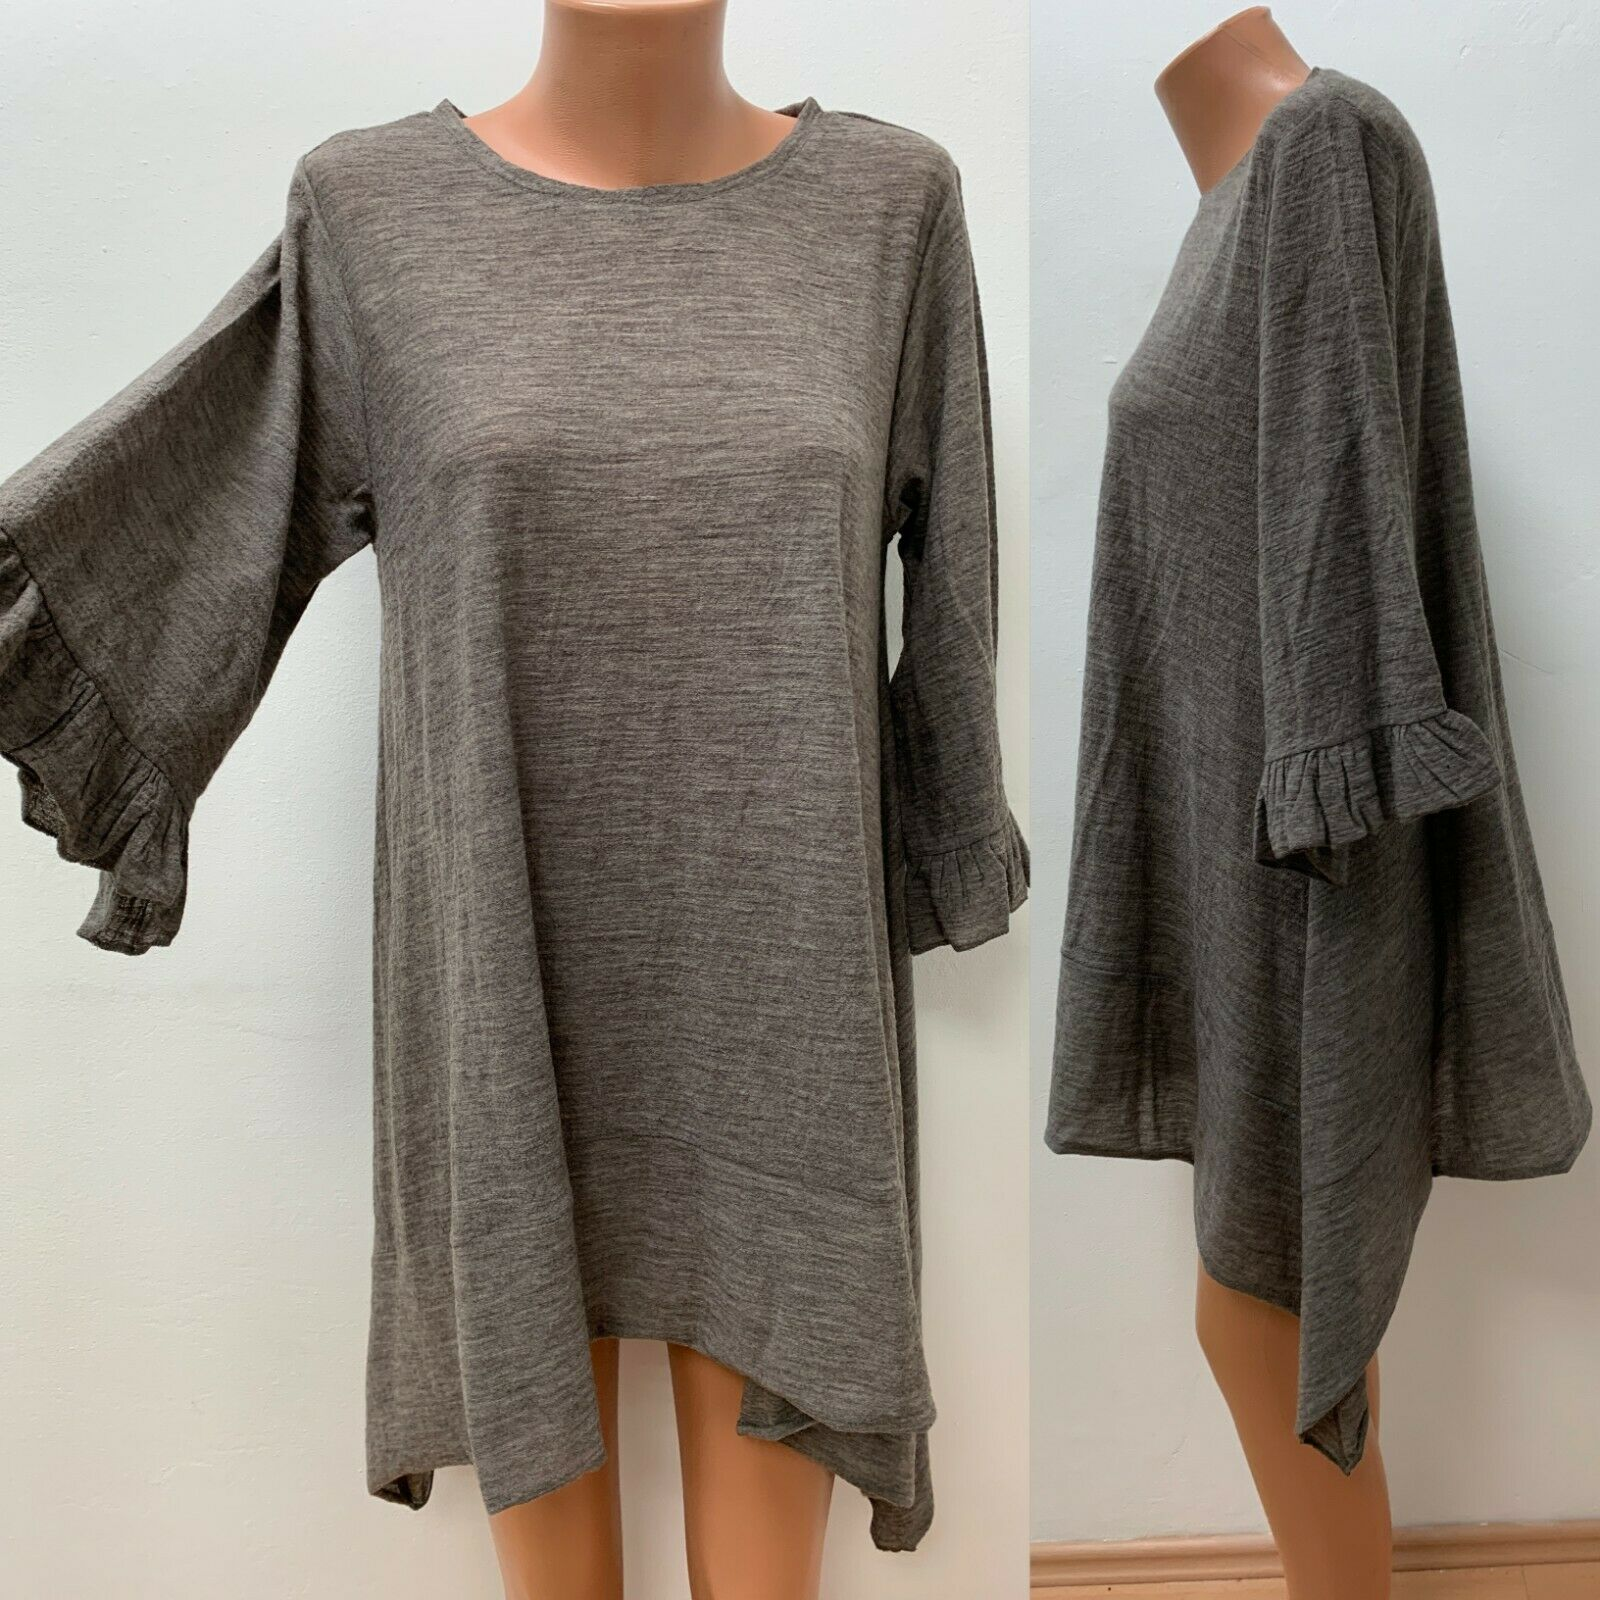 Deerberg Size L/XL Knitted Dress Tunic Asymmetric Hem Brown vllt with Wool